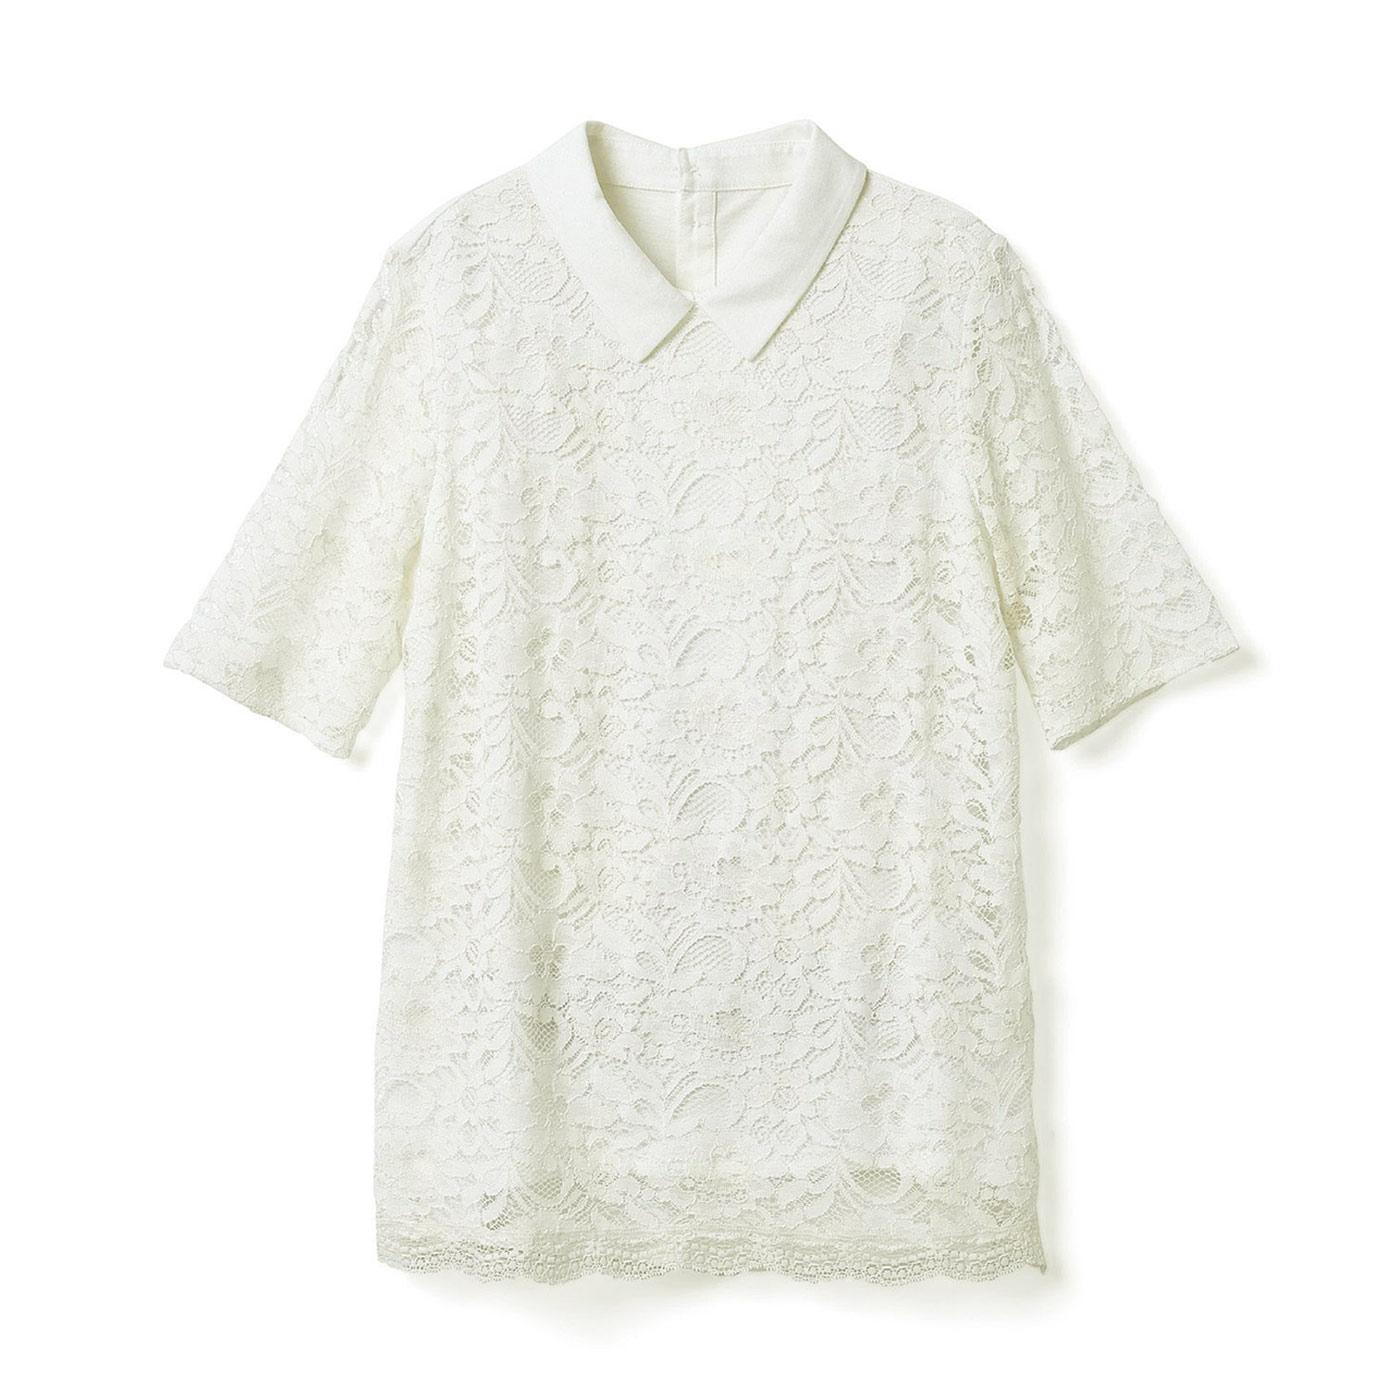 DRECO by IEDIT 着るだけで上品華やか!吸汗速乾カットソードッキング衿付きレーストップス<ホワイト>